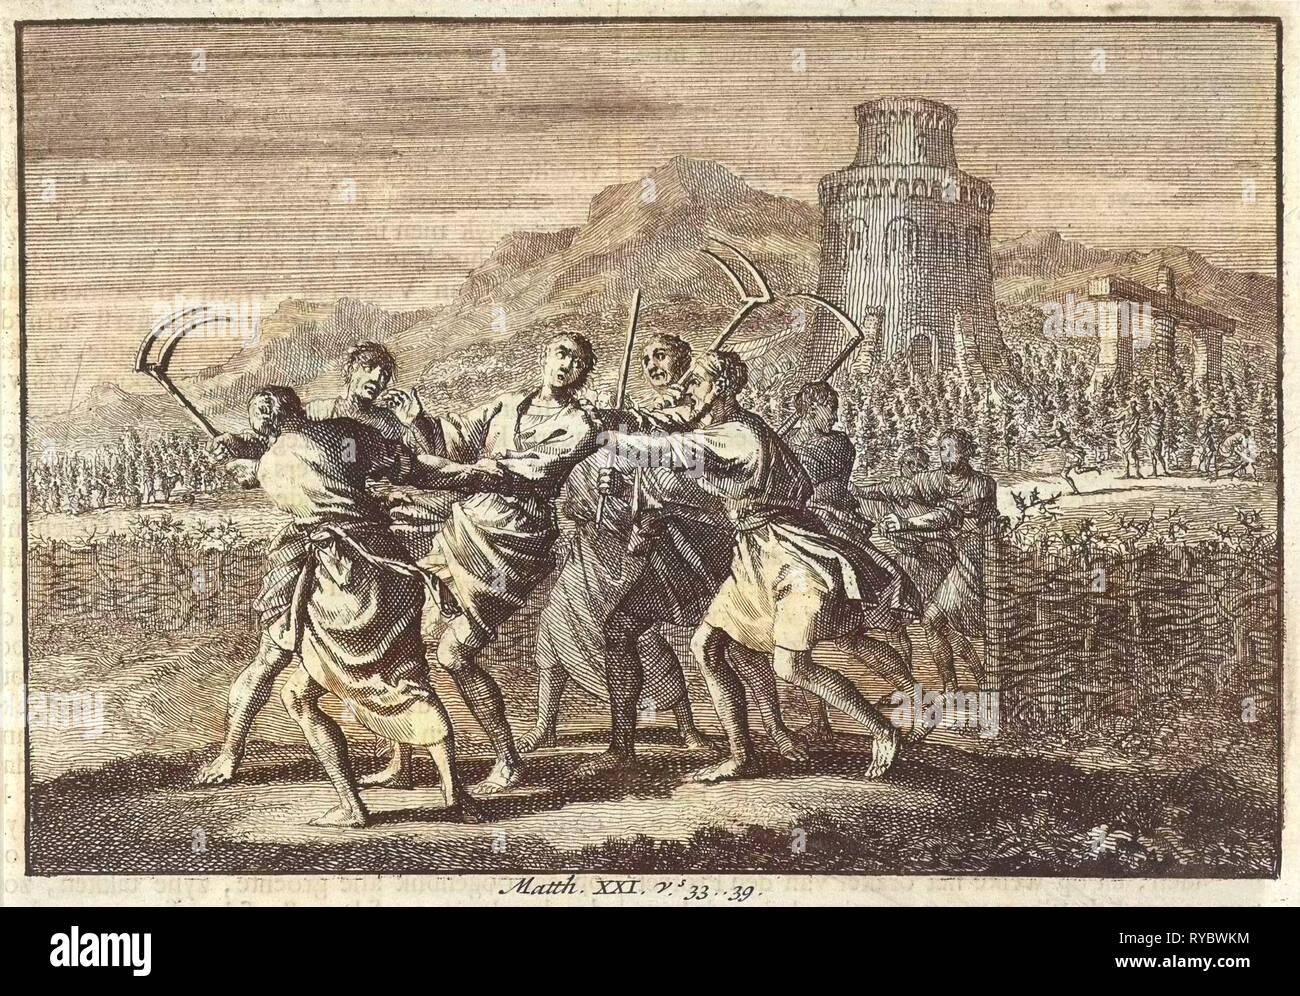 Parable of the tenants of the vineyard, Jan Luyken, 1703 - 1762 - Stock Image